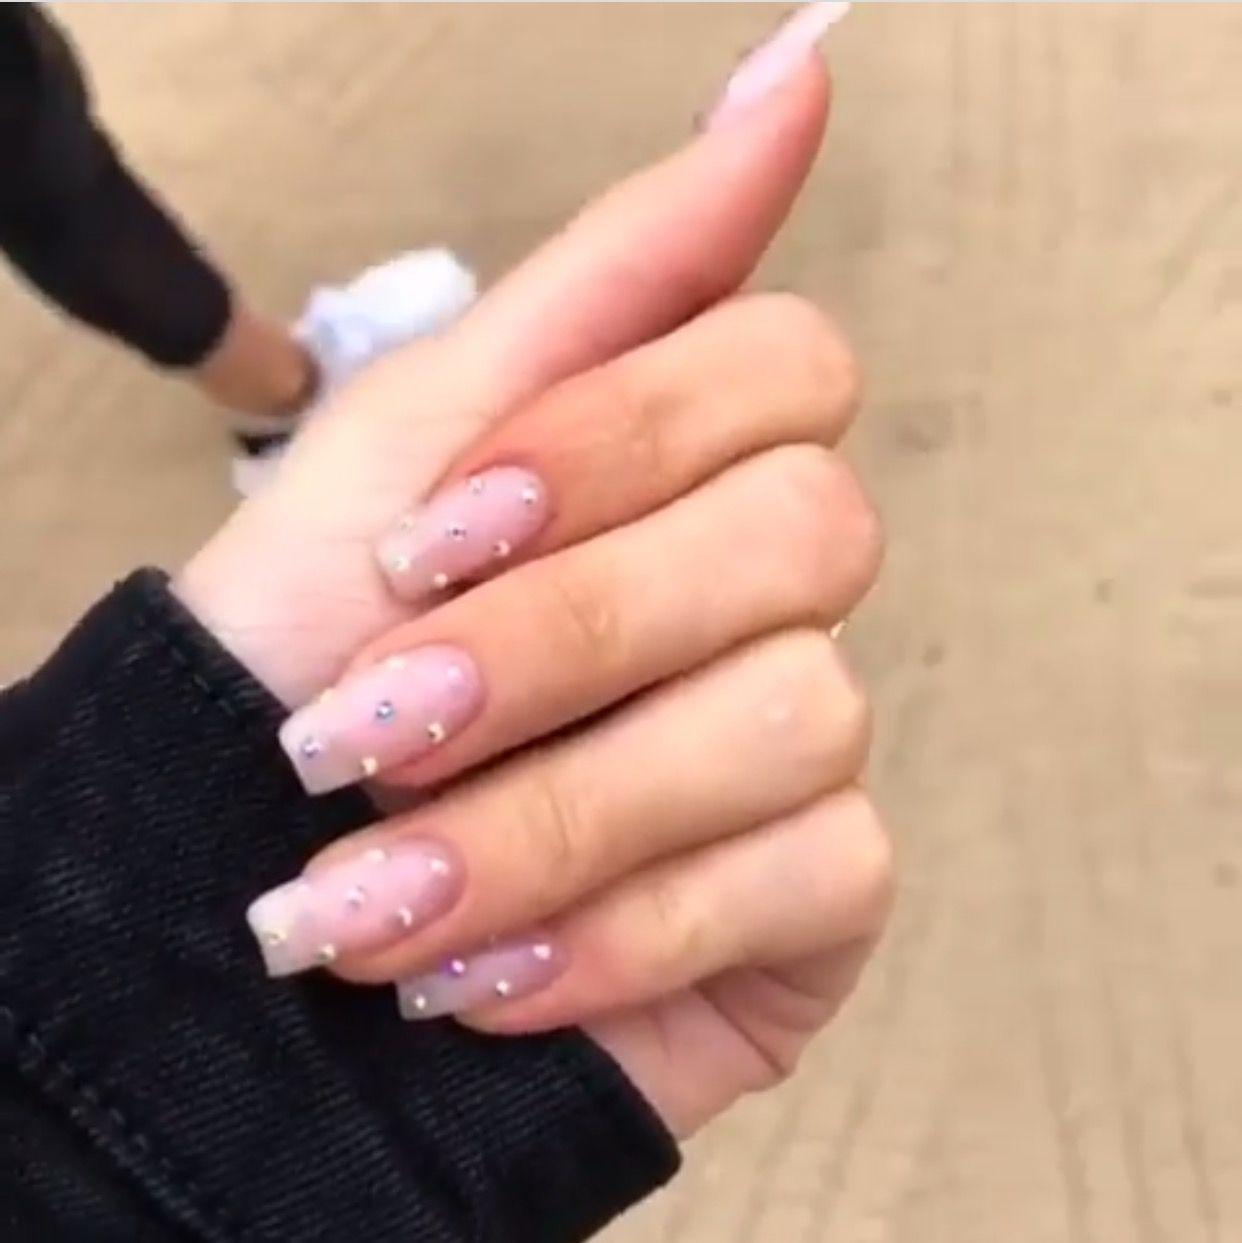 Kylie Jenner Nails Kyliejenner Kyliejennernails Nailideas Nailartistr Kylie Nails Hard Gel Nails Luxury Nails